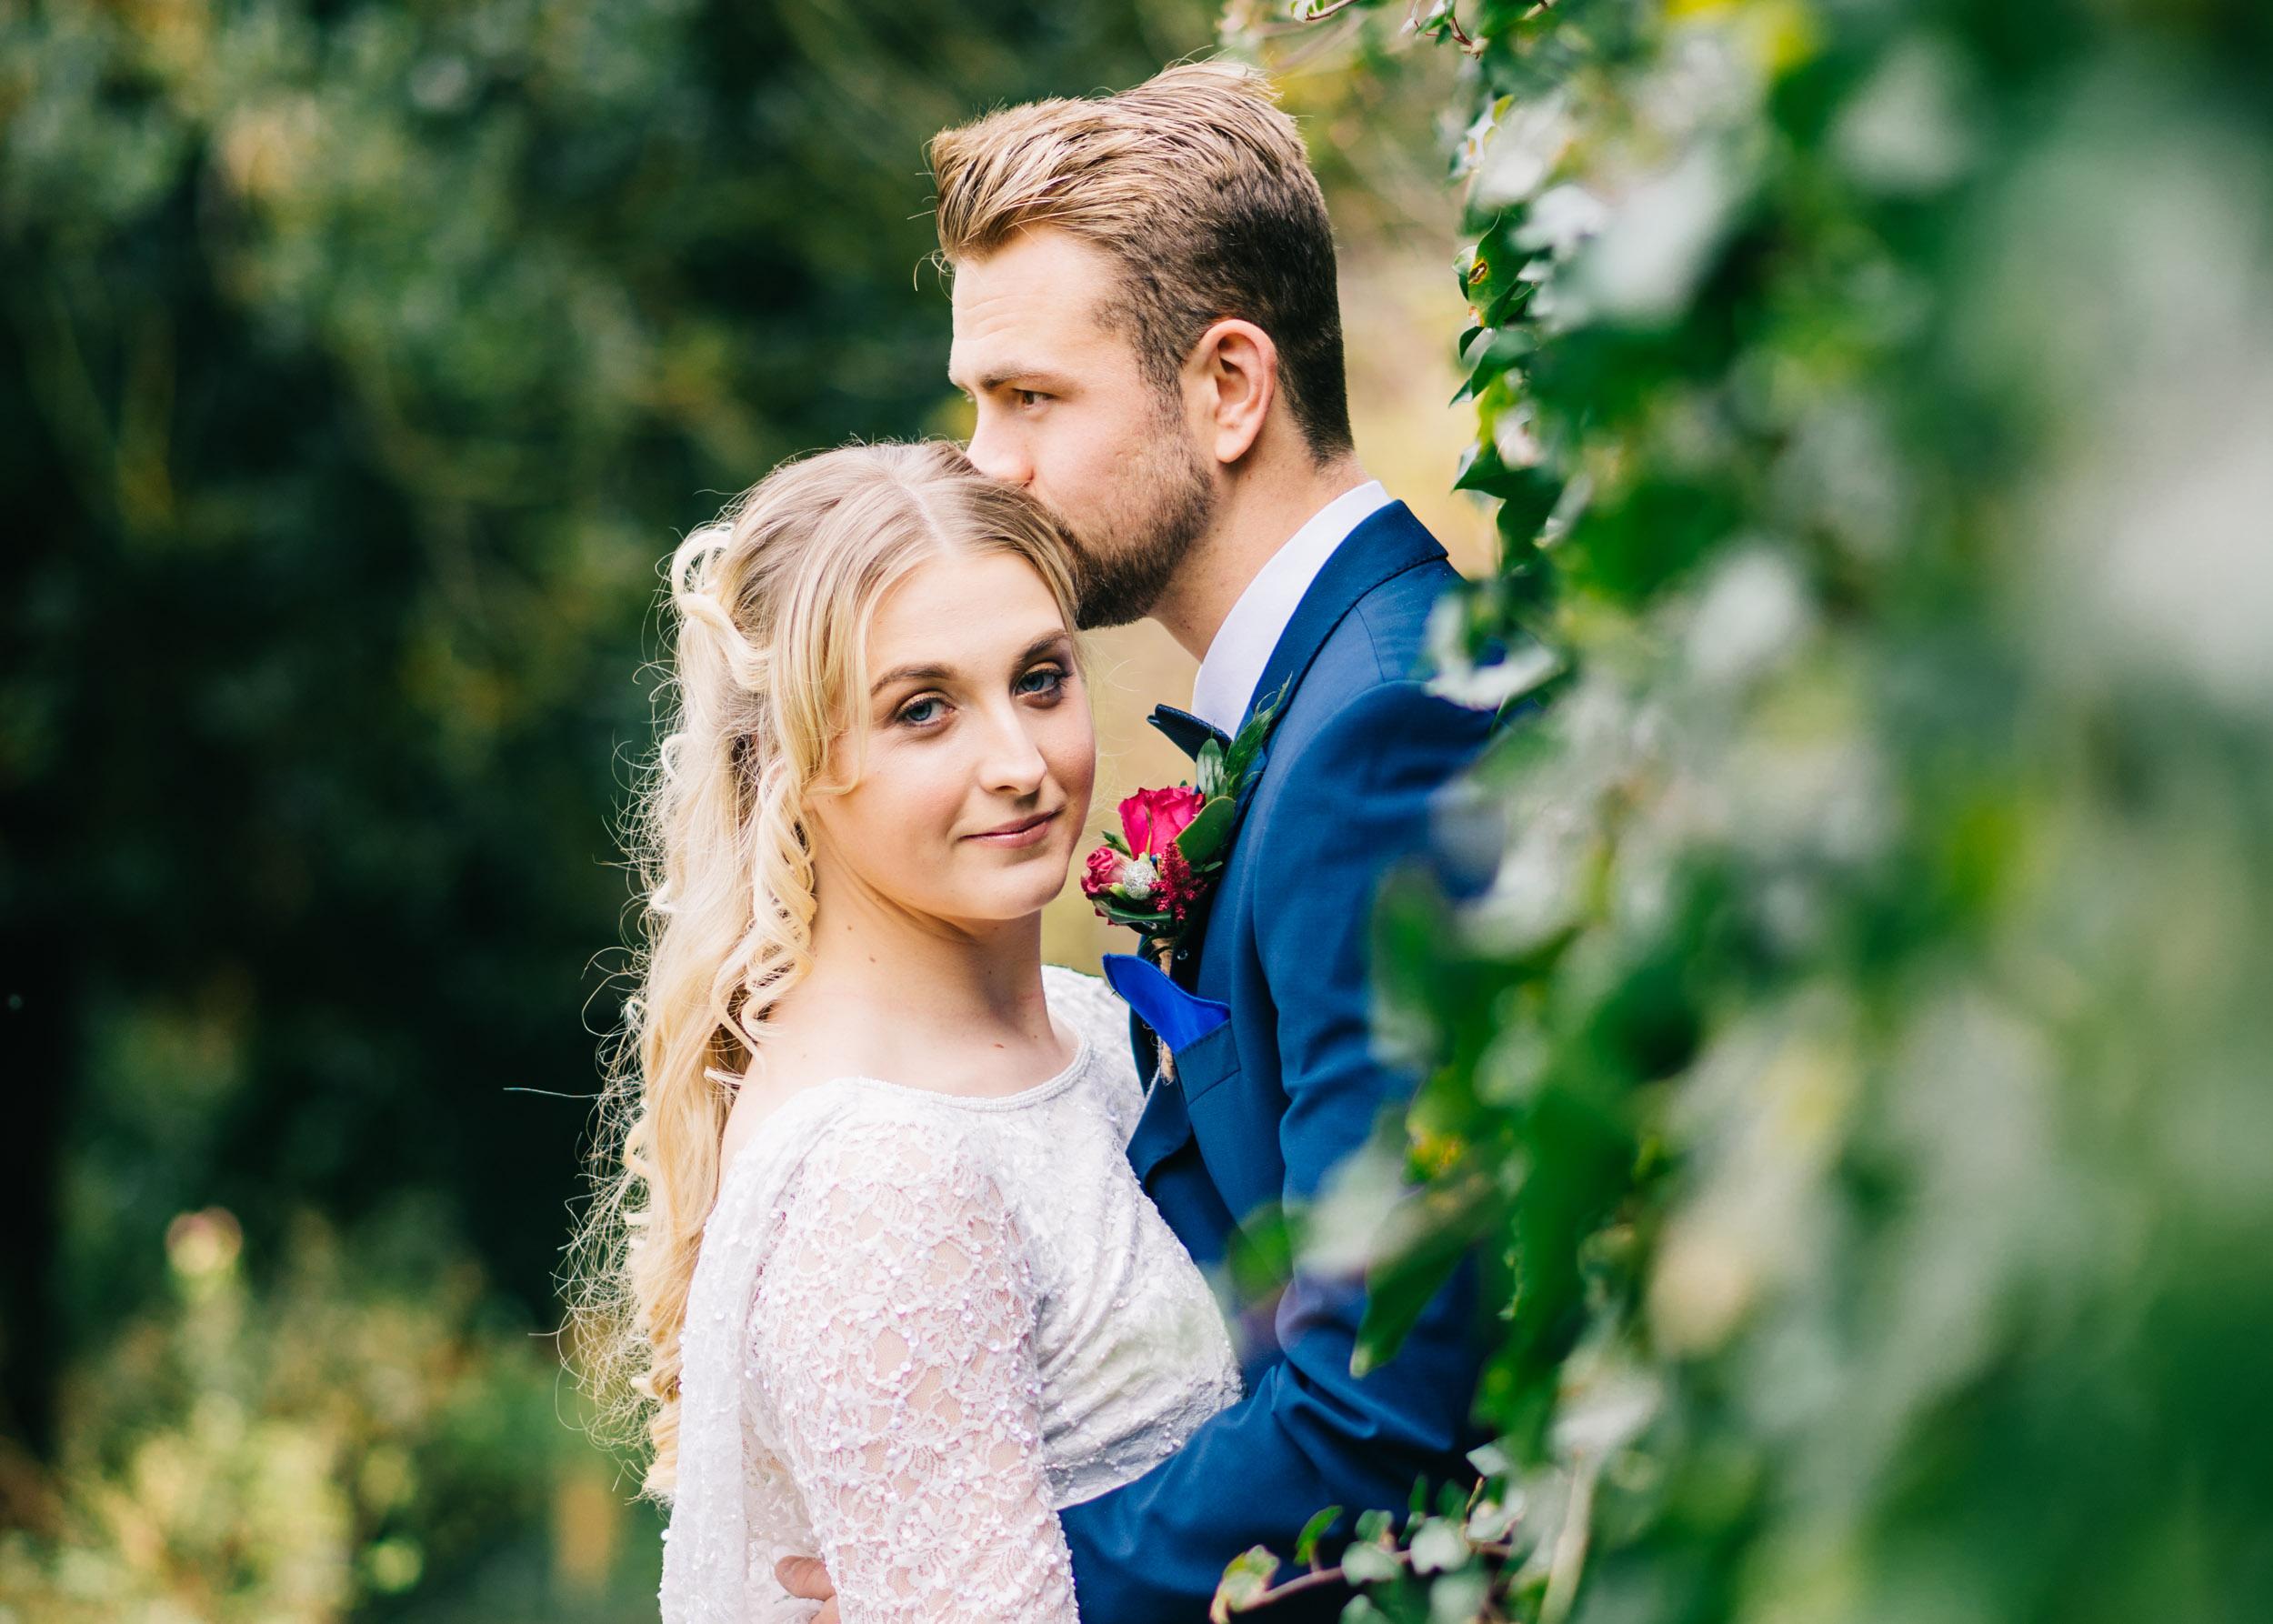 Mitton Hall Wedding Photography- Laura Duggleby Photographer5